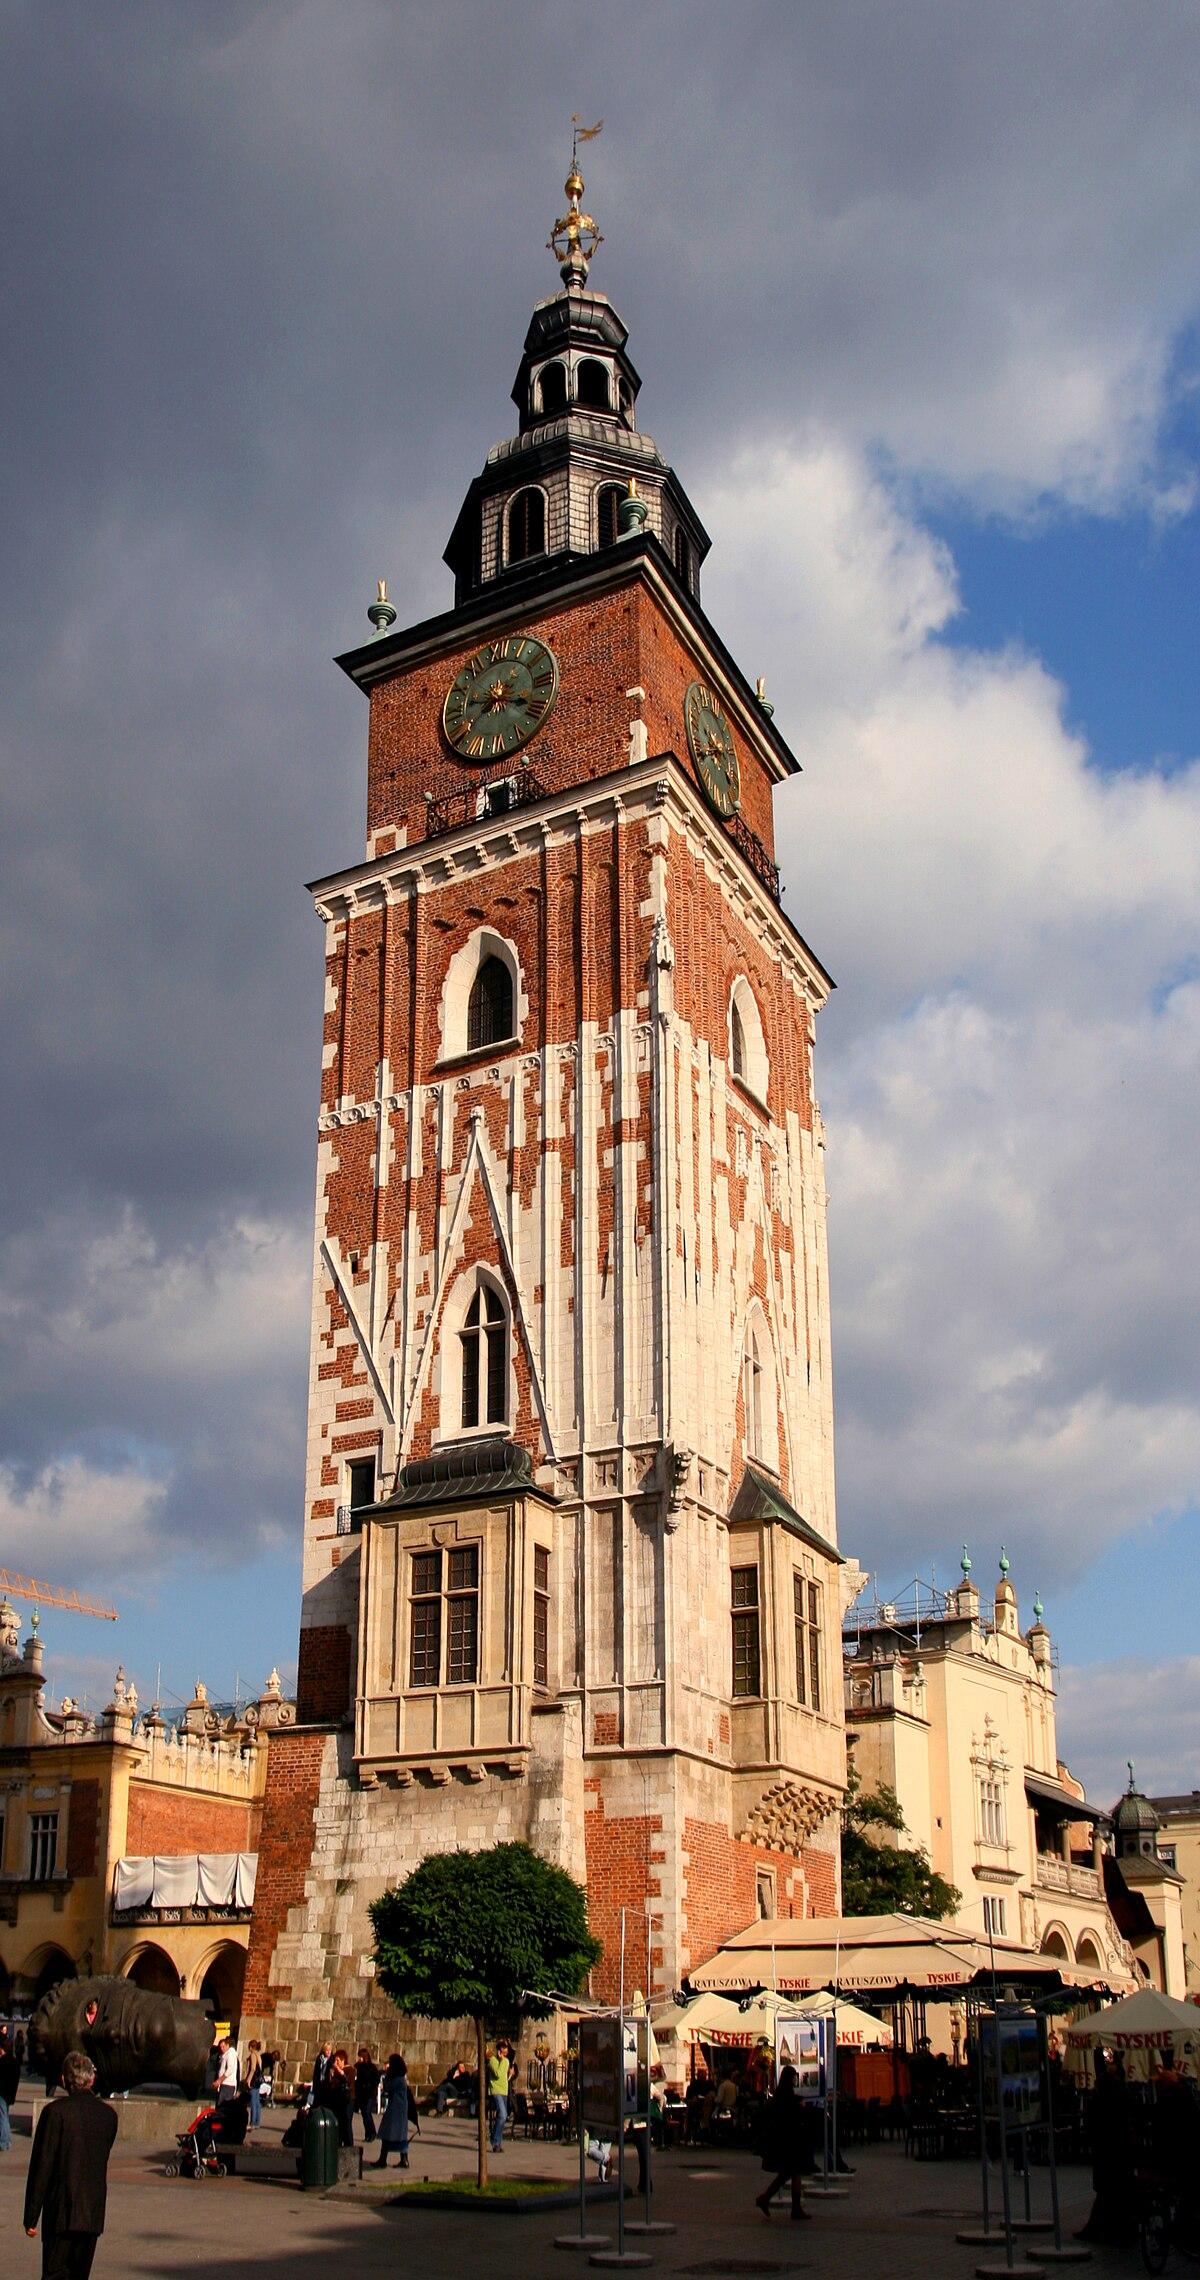 Town Hall Tower, Kraków - Wikipedia